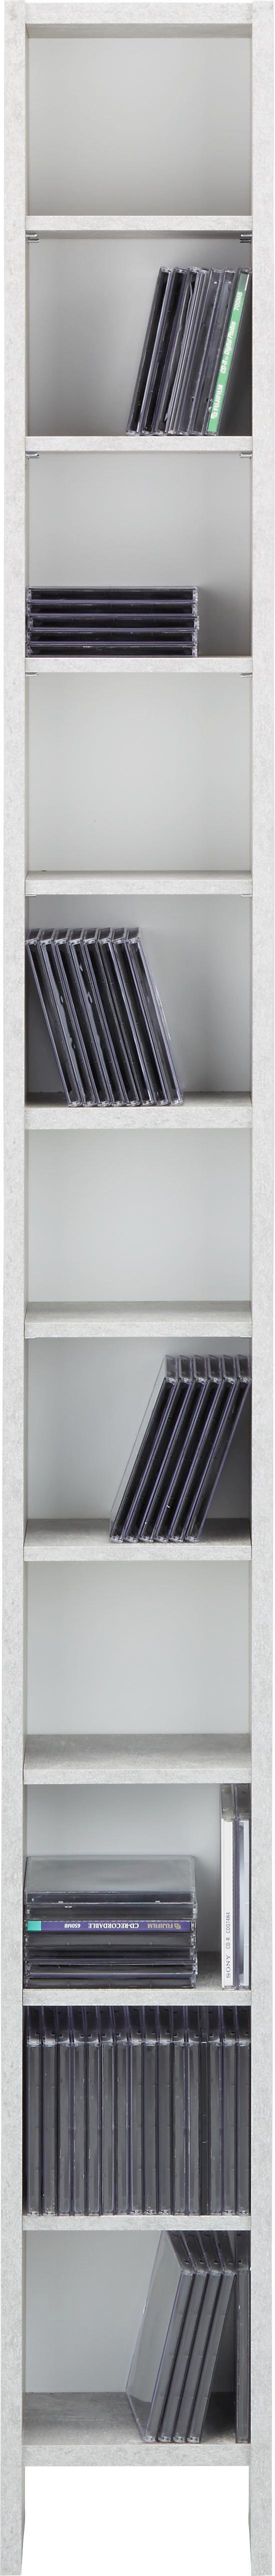 CD-Regal Grau/Weiß - Weiß/Grau, Holz/Holzwerkstoff (19,5/185/16,5cm) - Mömax modern living